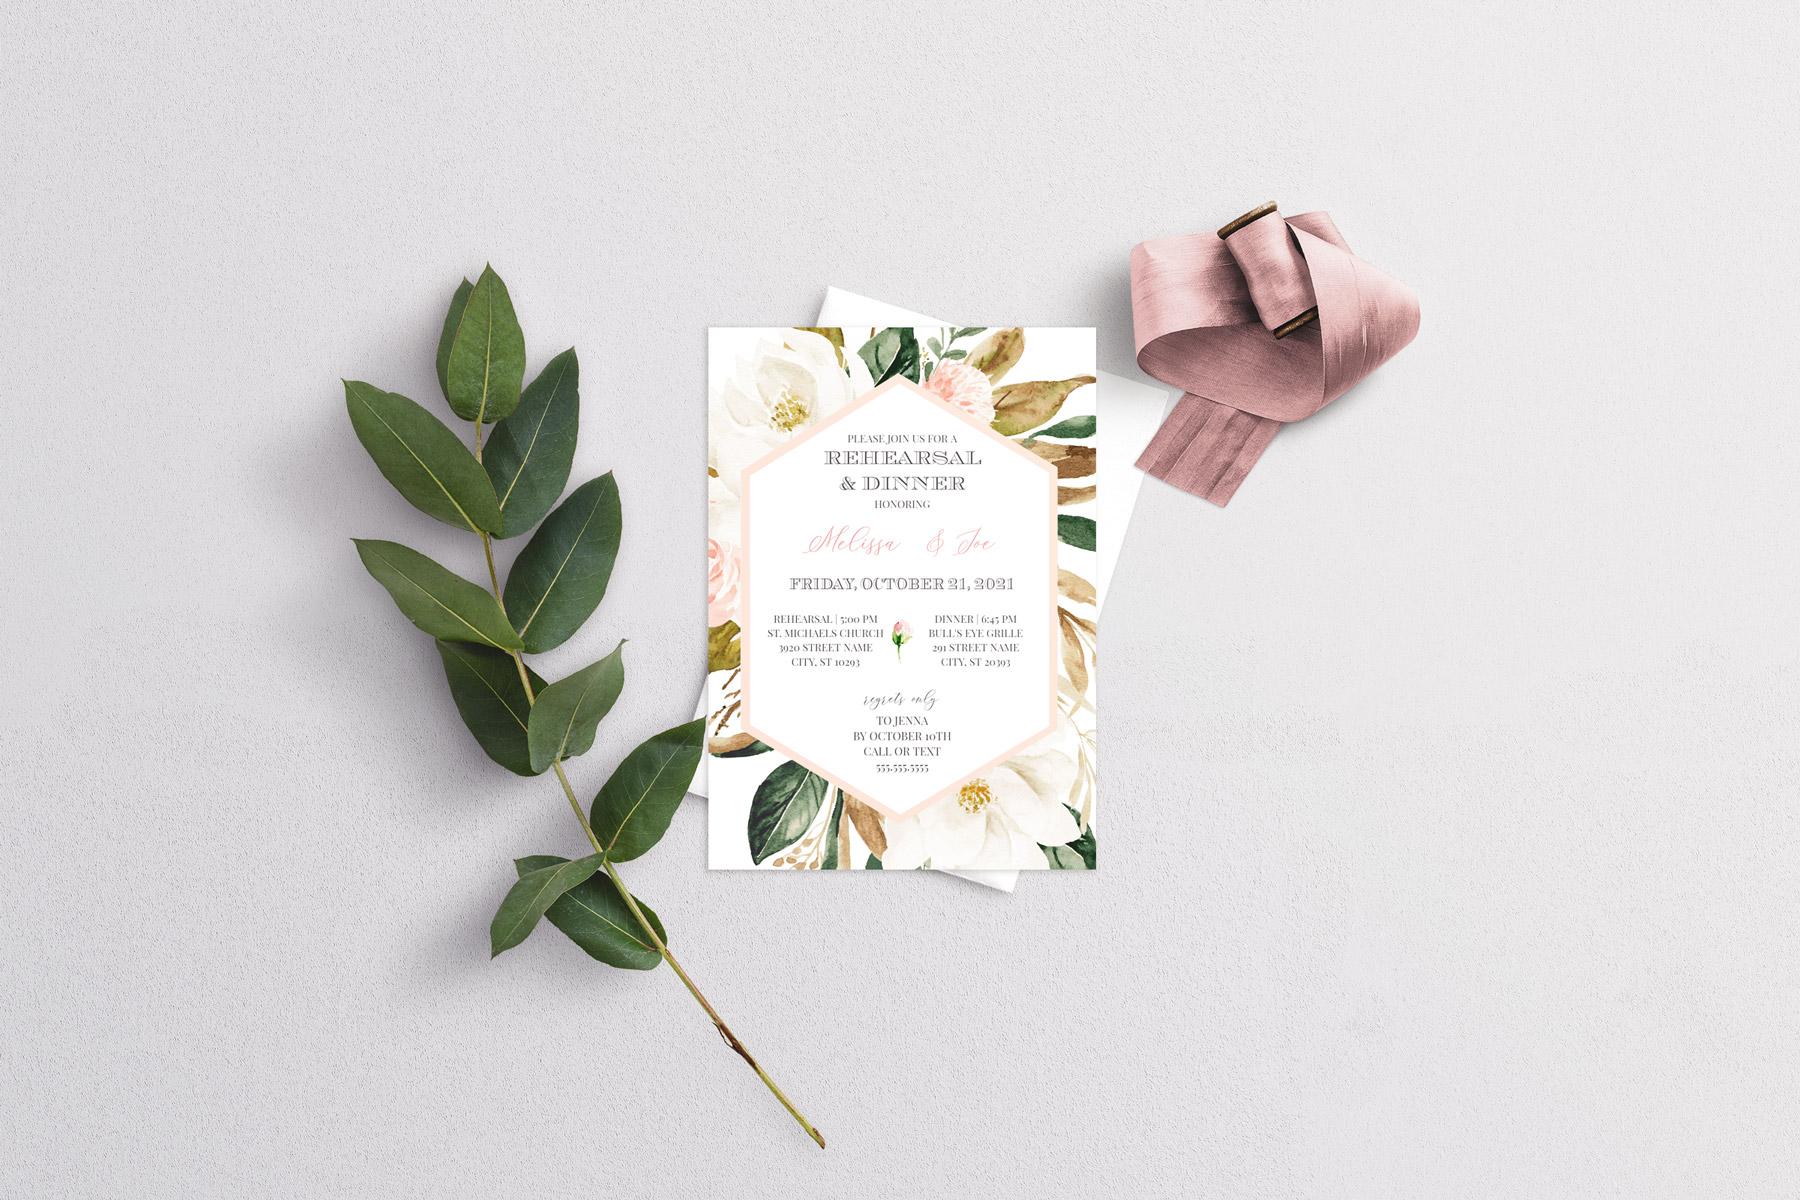 blush-magnolia-rehearsal-dinner-invitation-2